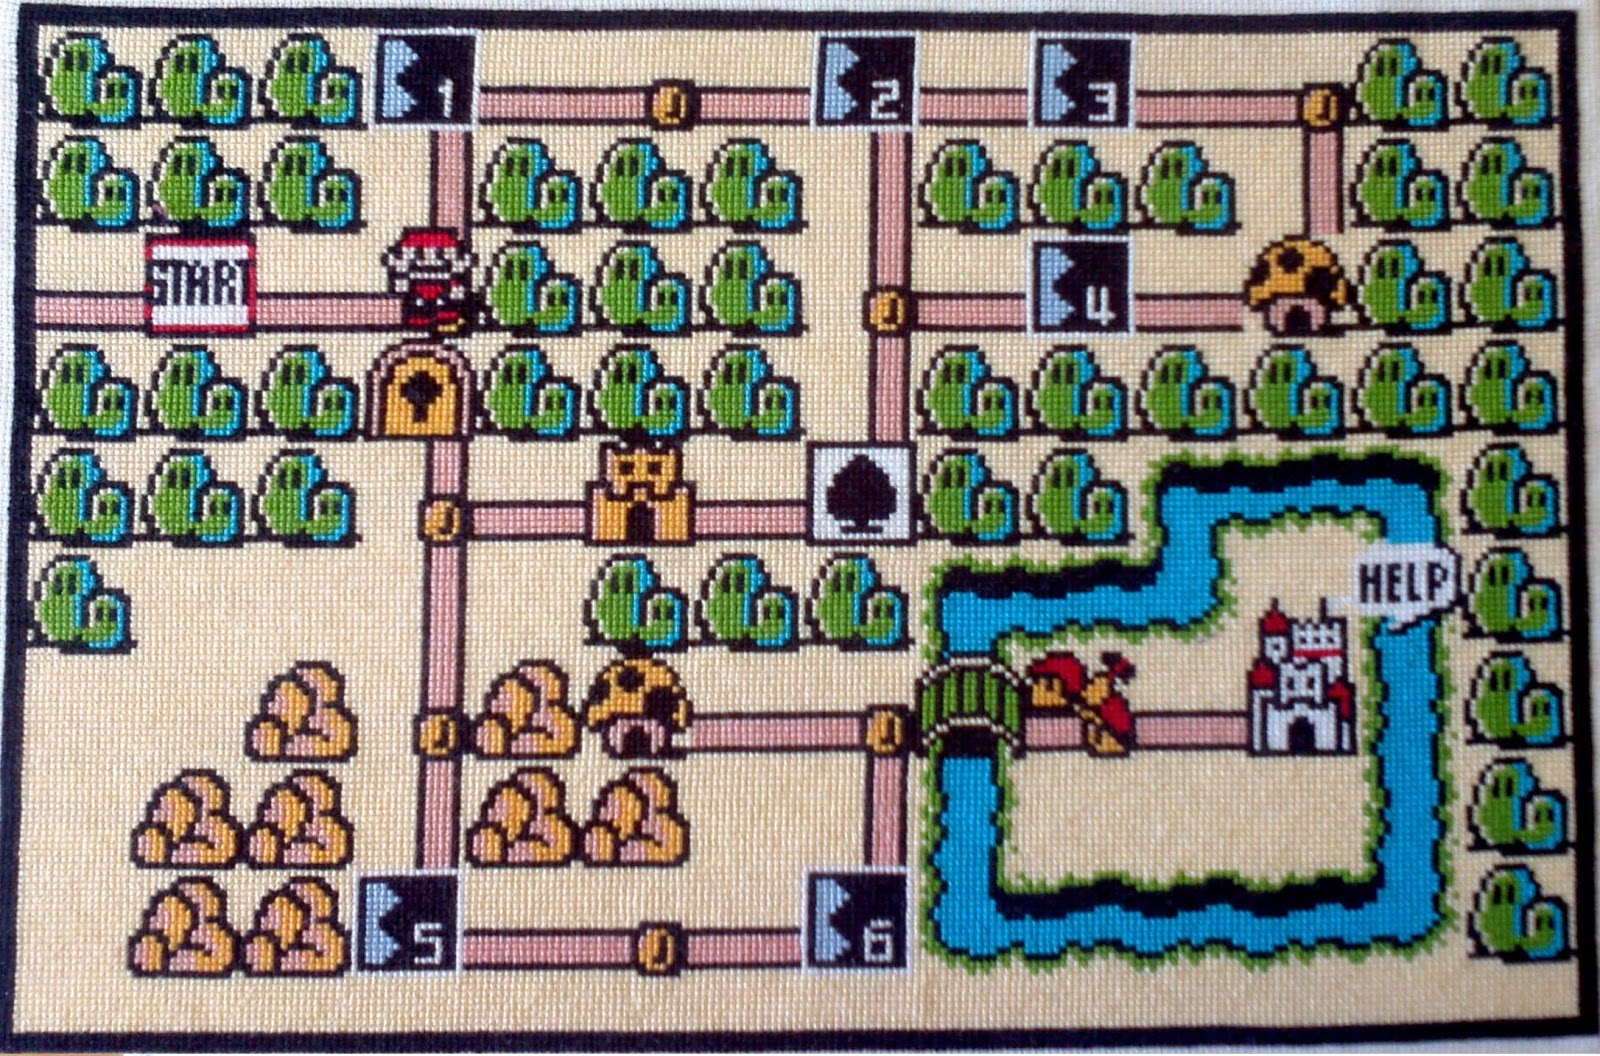 Look a distraction super mario bros 3 world 1 map super mario bros 3 world 1 map publicscrutiny Images